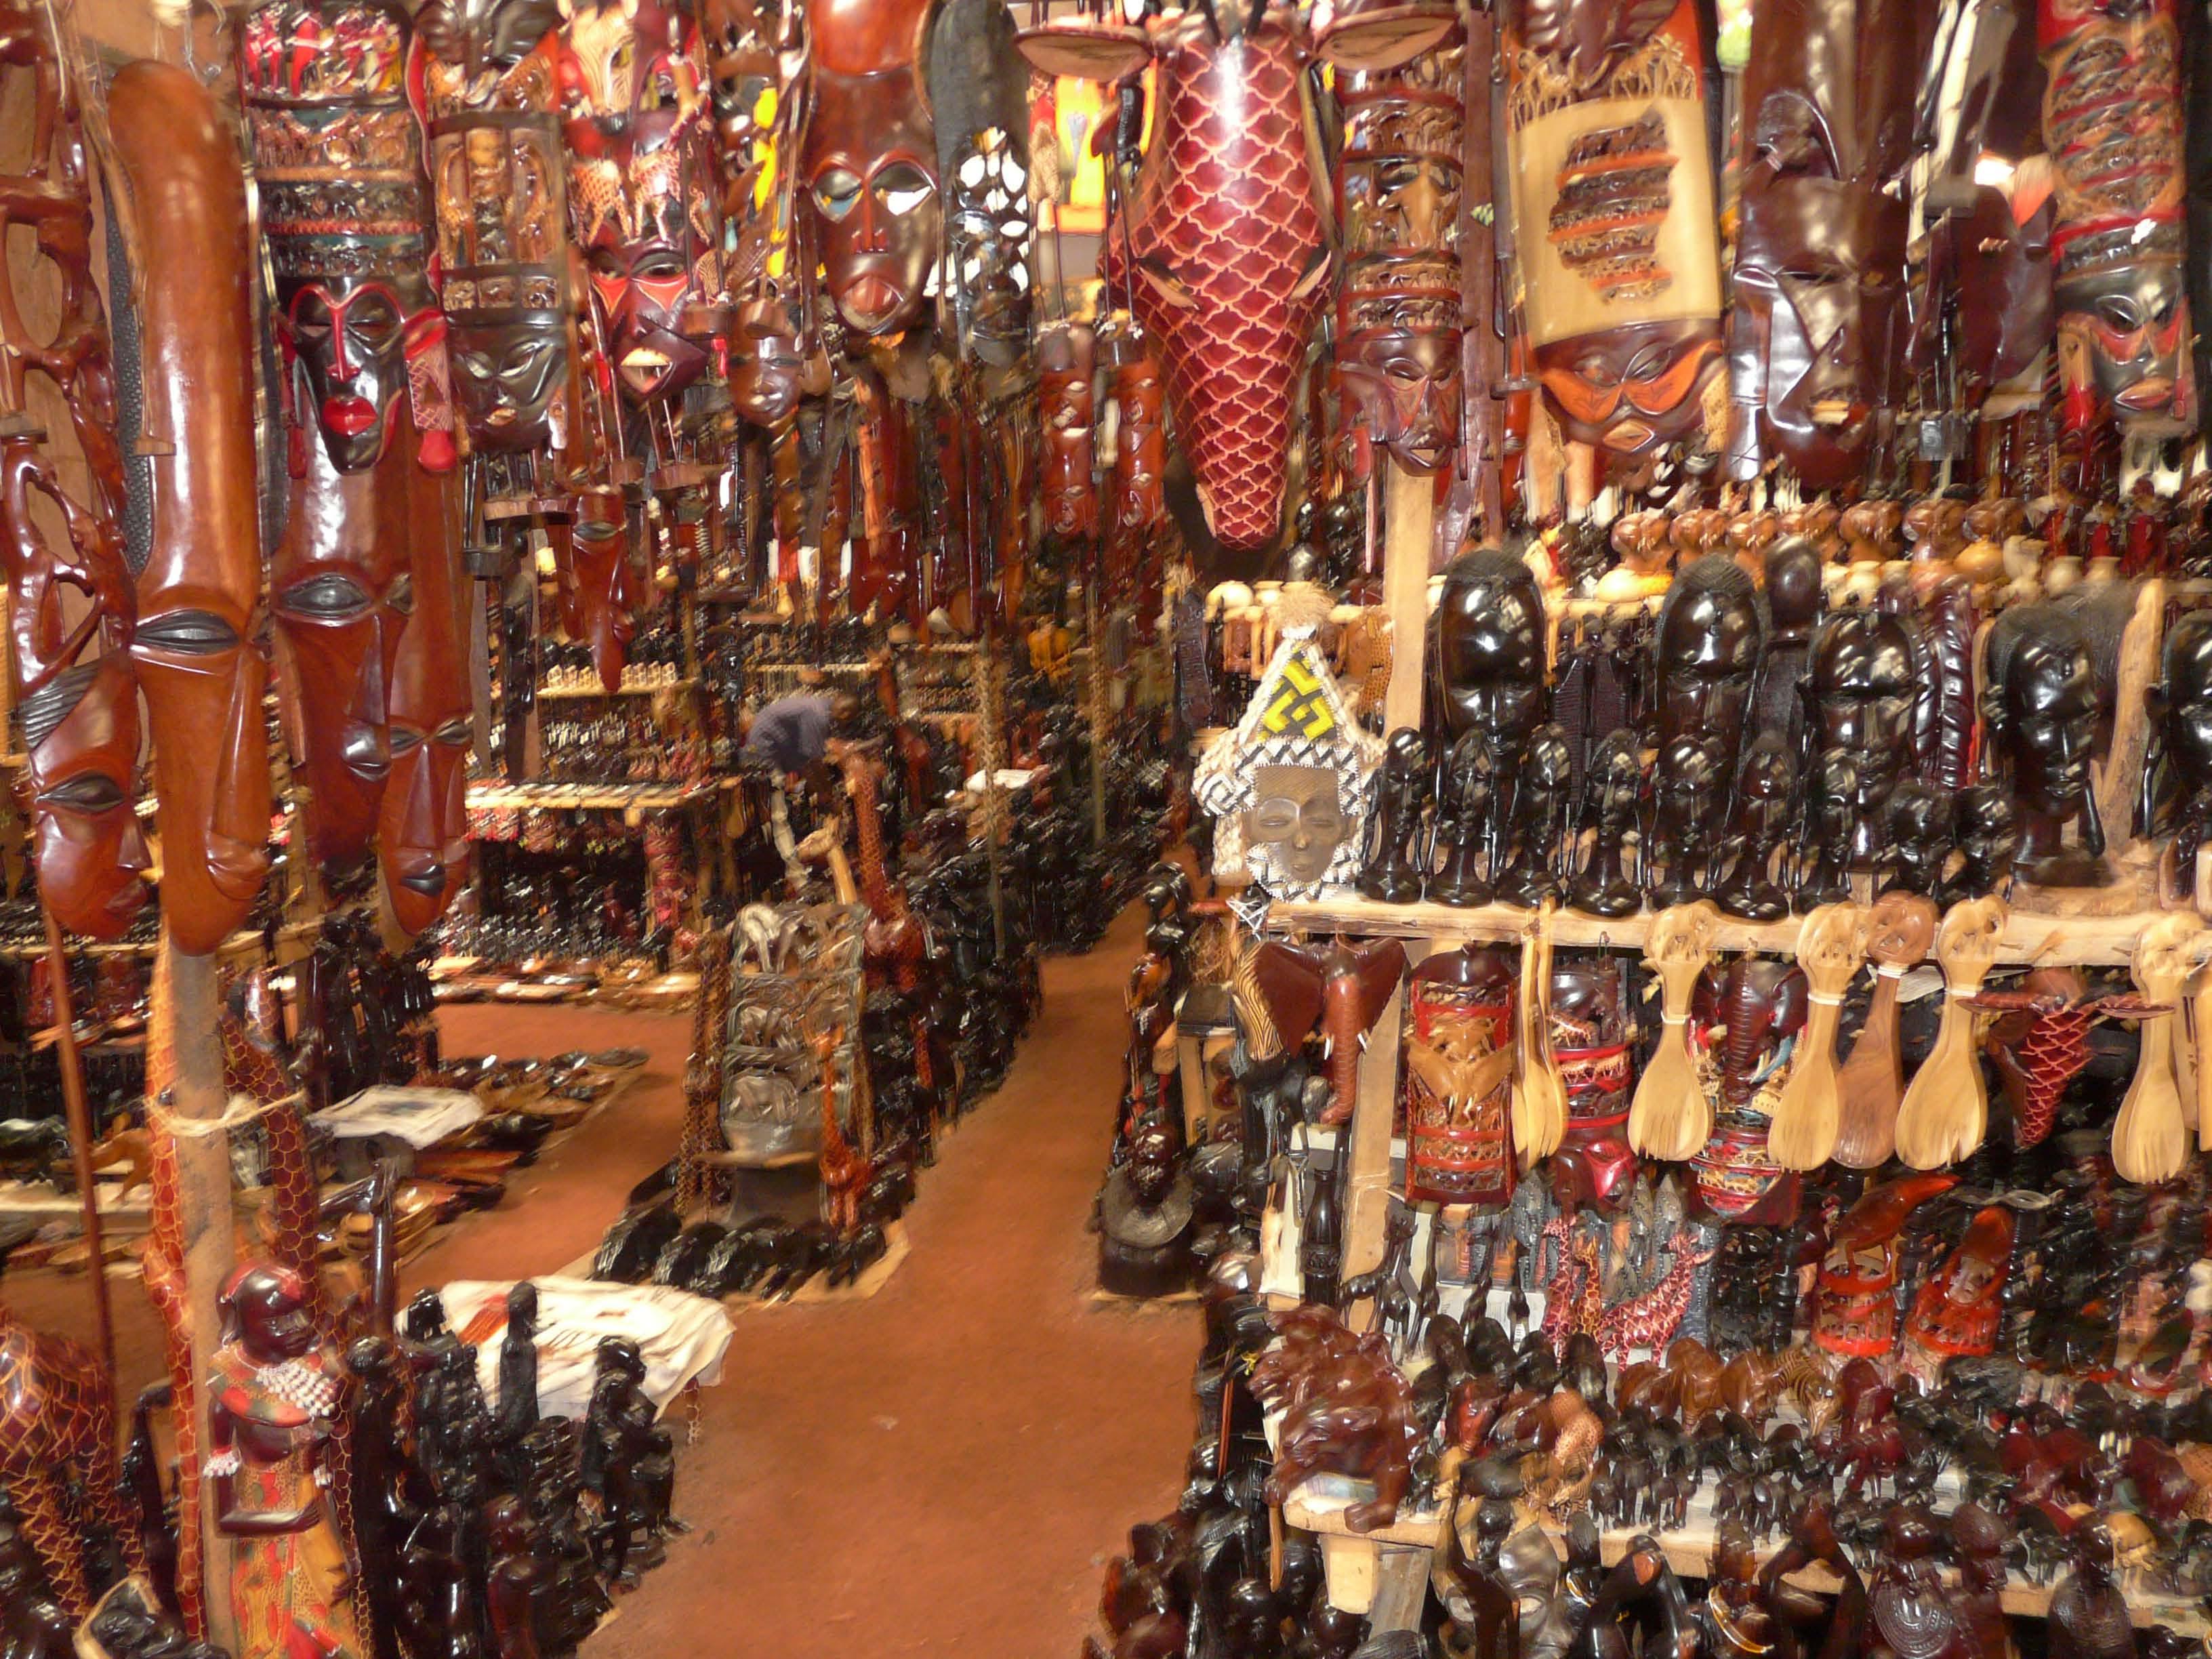 Karatu Tanzania  city pictures gallery : ... – Best Photos » Inside the ebony shop – Near Karatu Tanzania